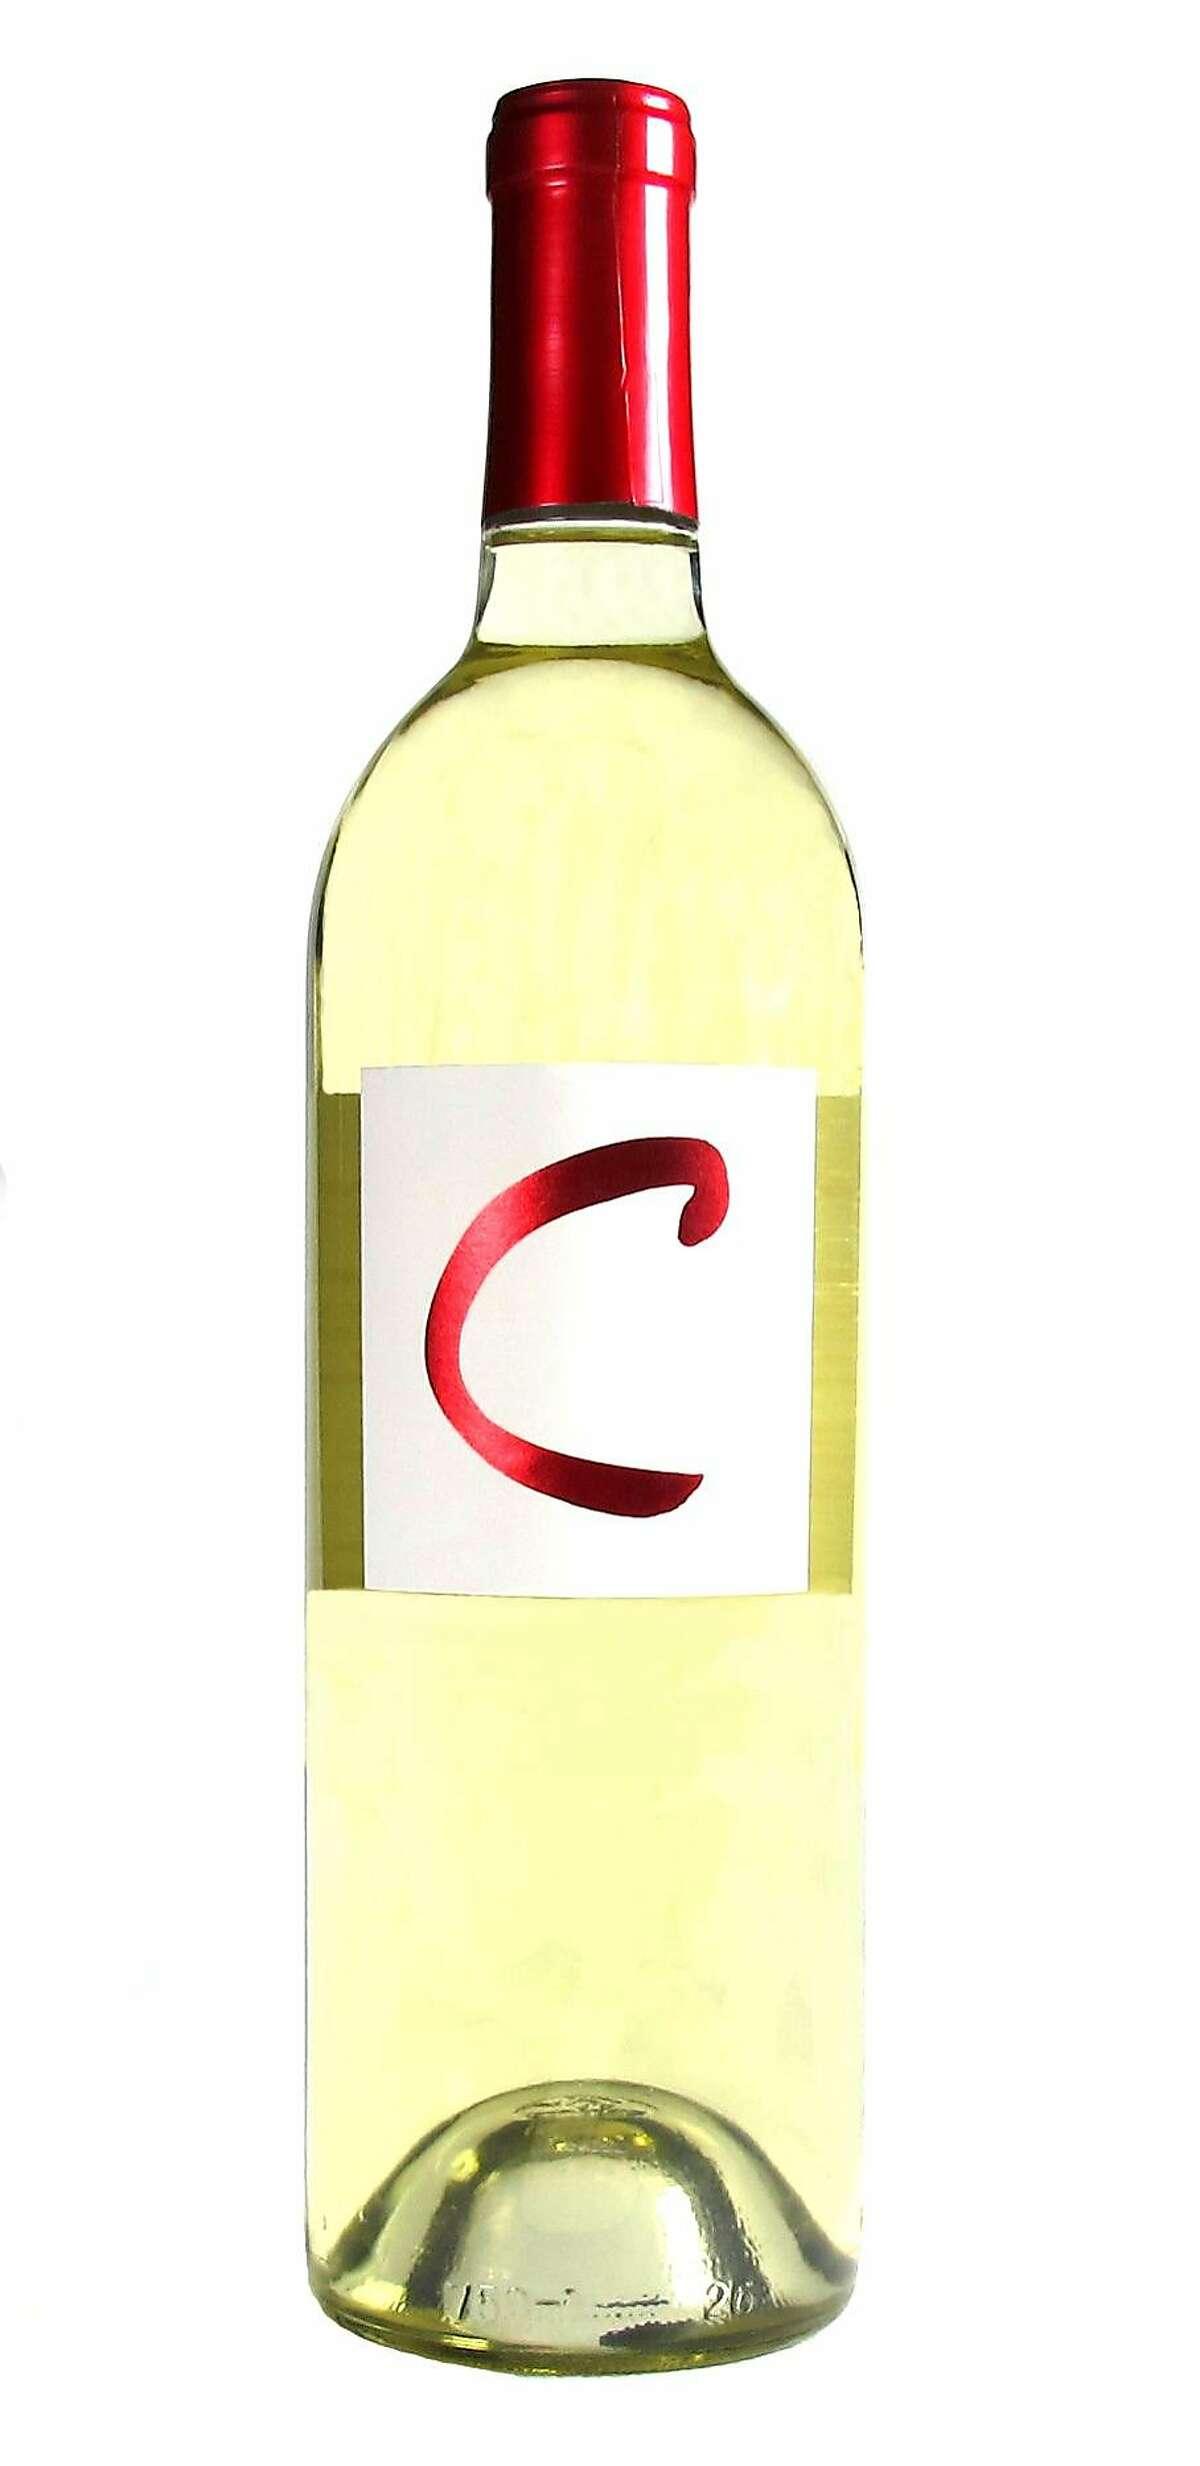 Red C Sauvignon Blanc Allan Nelson Vineyard Dry Creek Valley 2014 ($24)